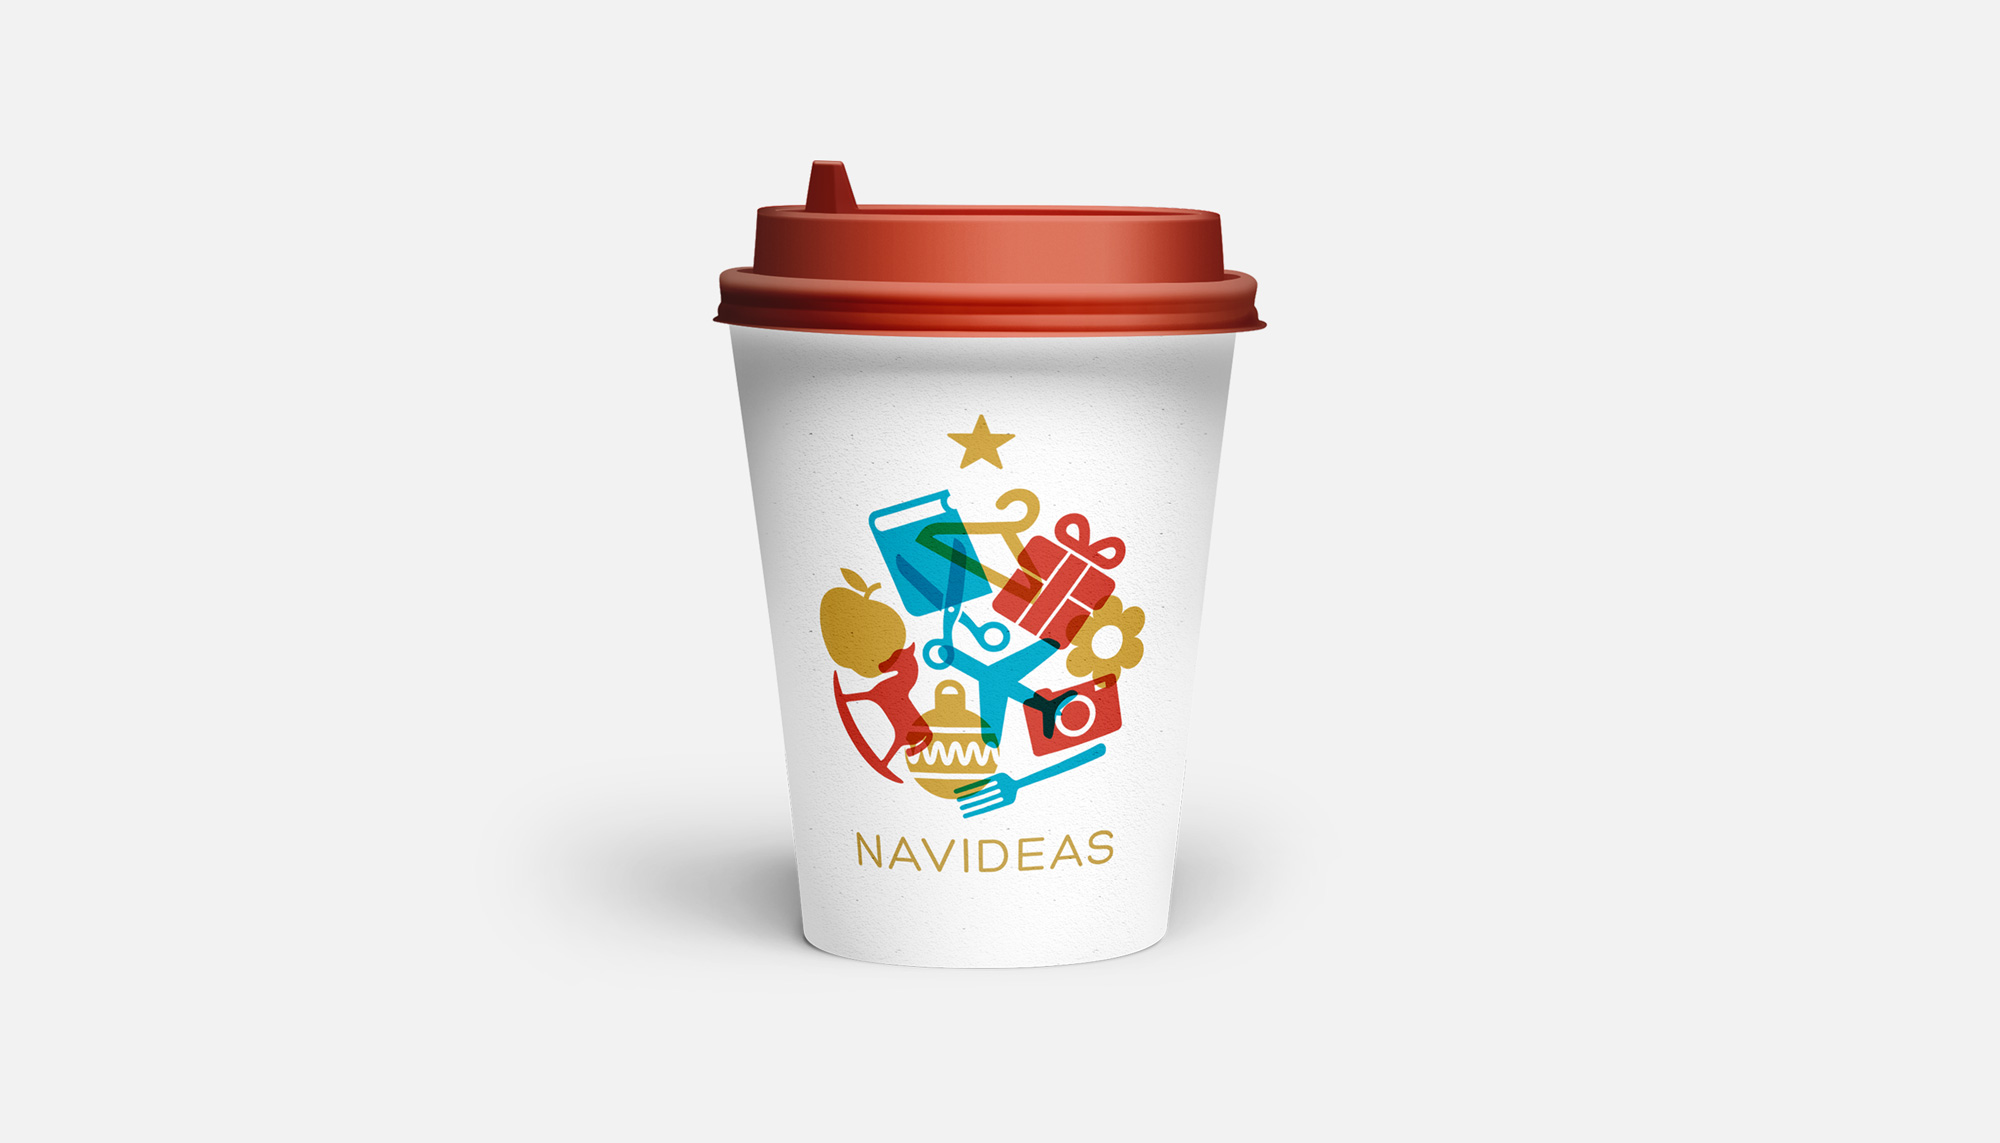 Merchandising Feria Navideas